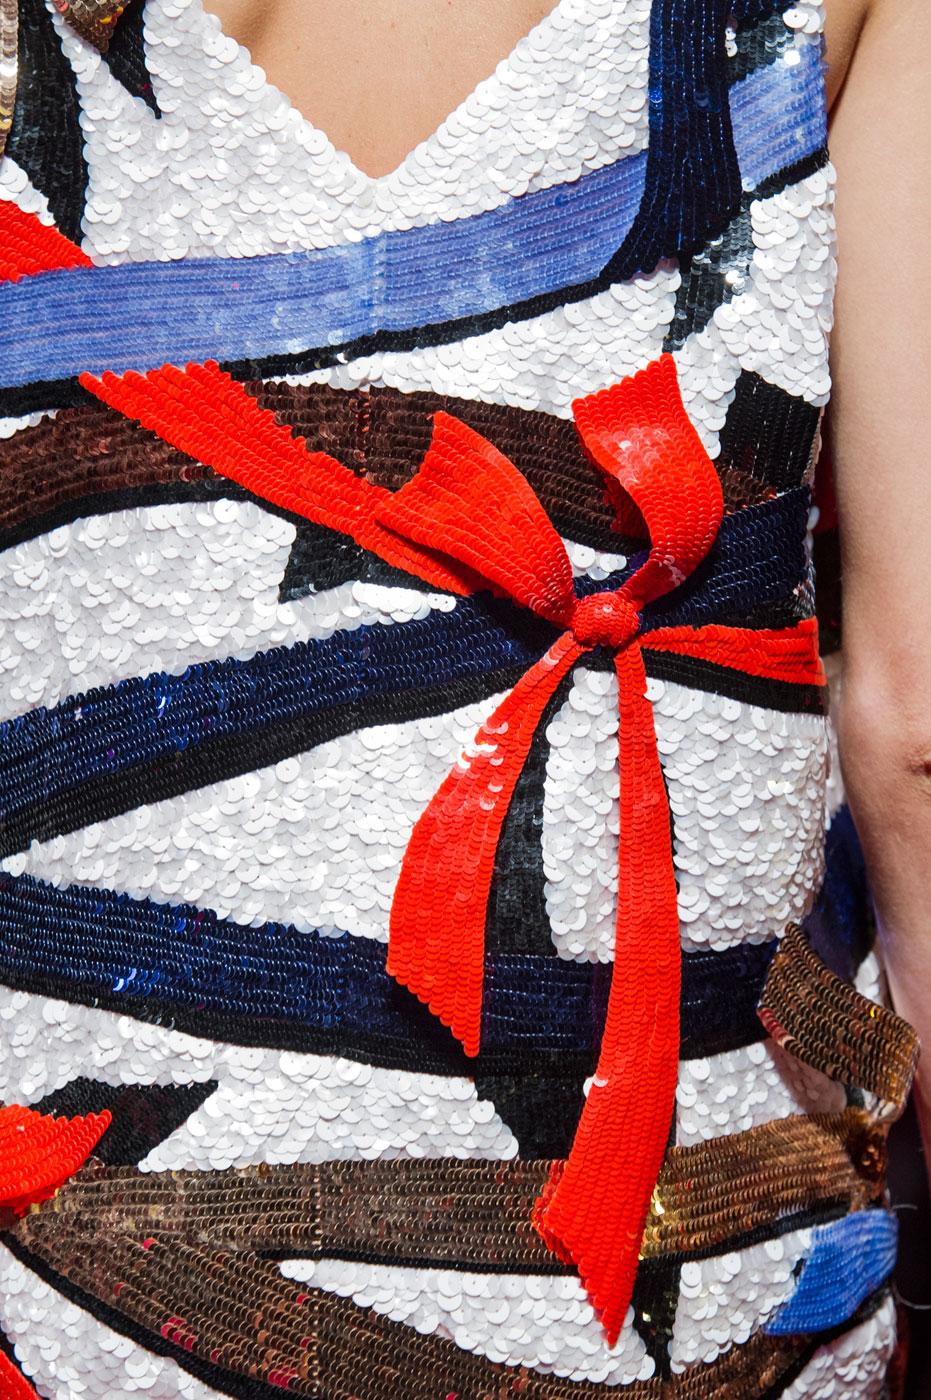 Schiaparelli-fashion-runway-show-close-ups-haute-couture-paris-spring-summer-2015-the-impression-50